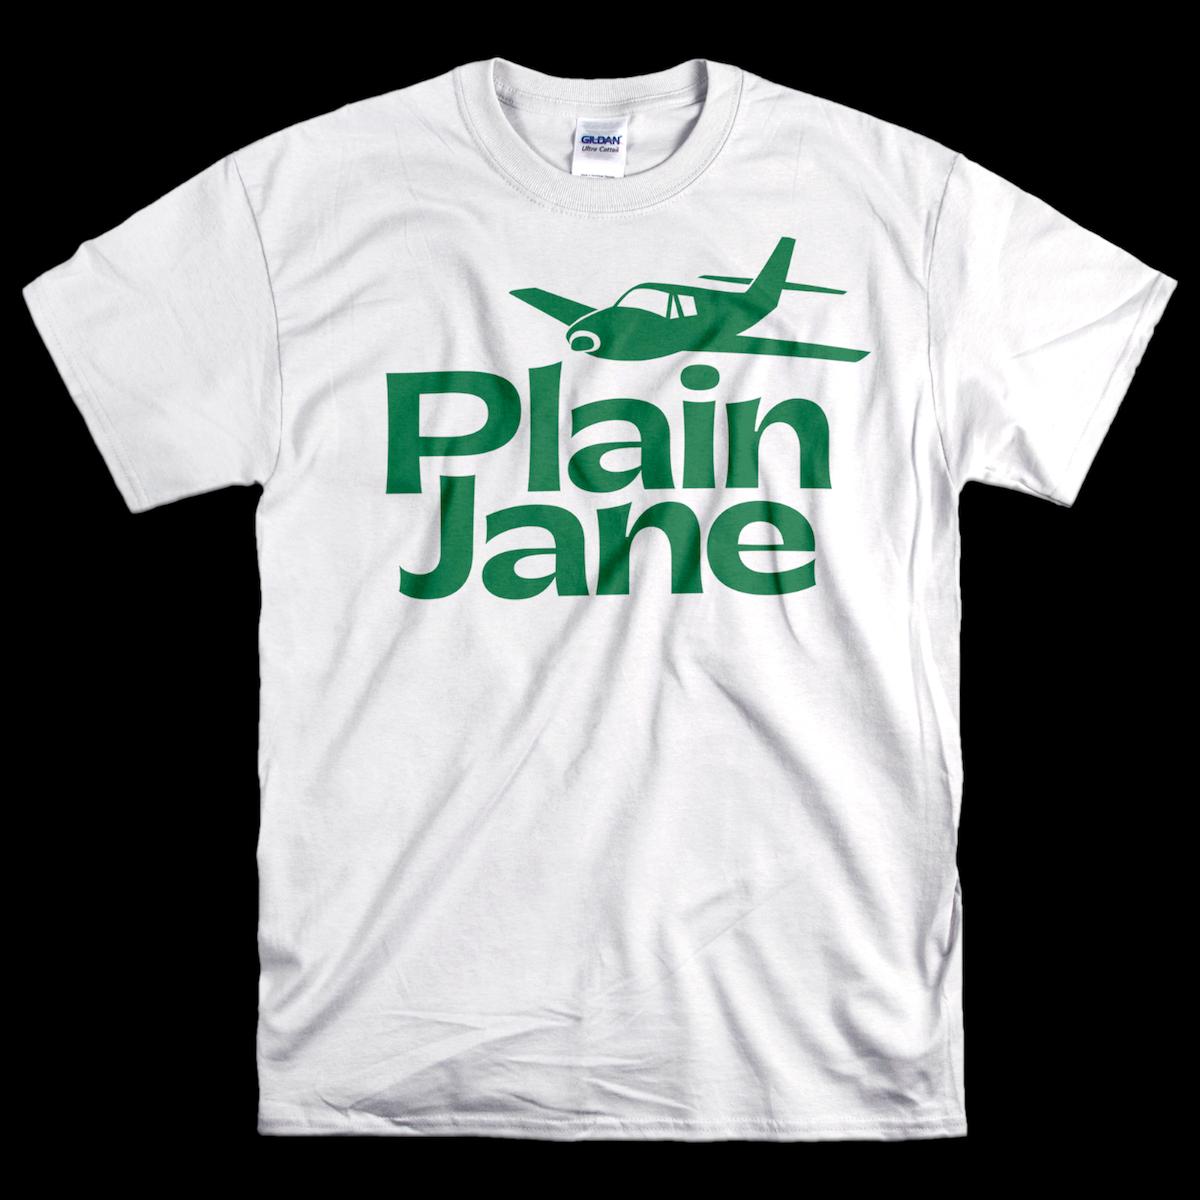 Plain Jane tee with Gatwick font